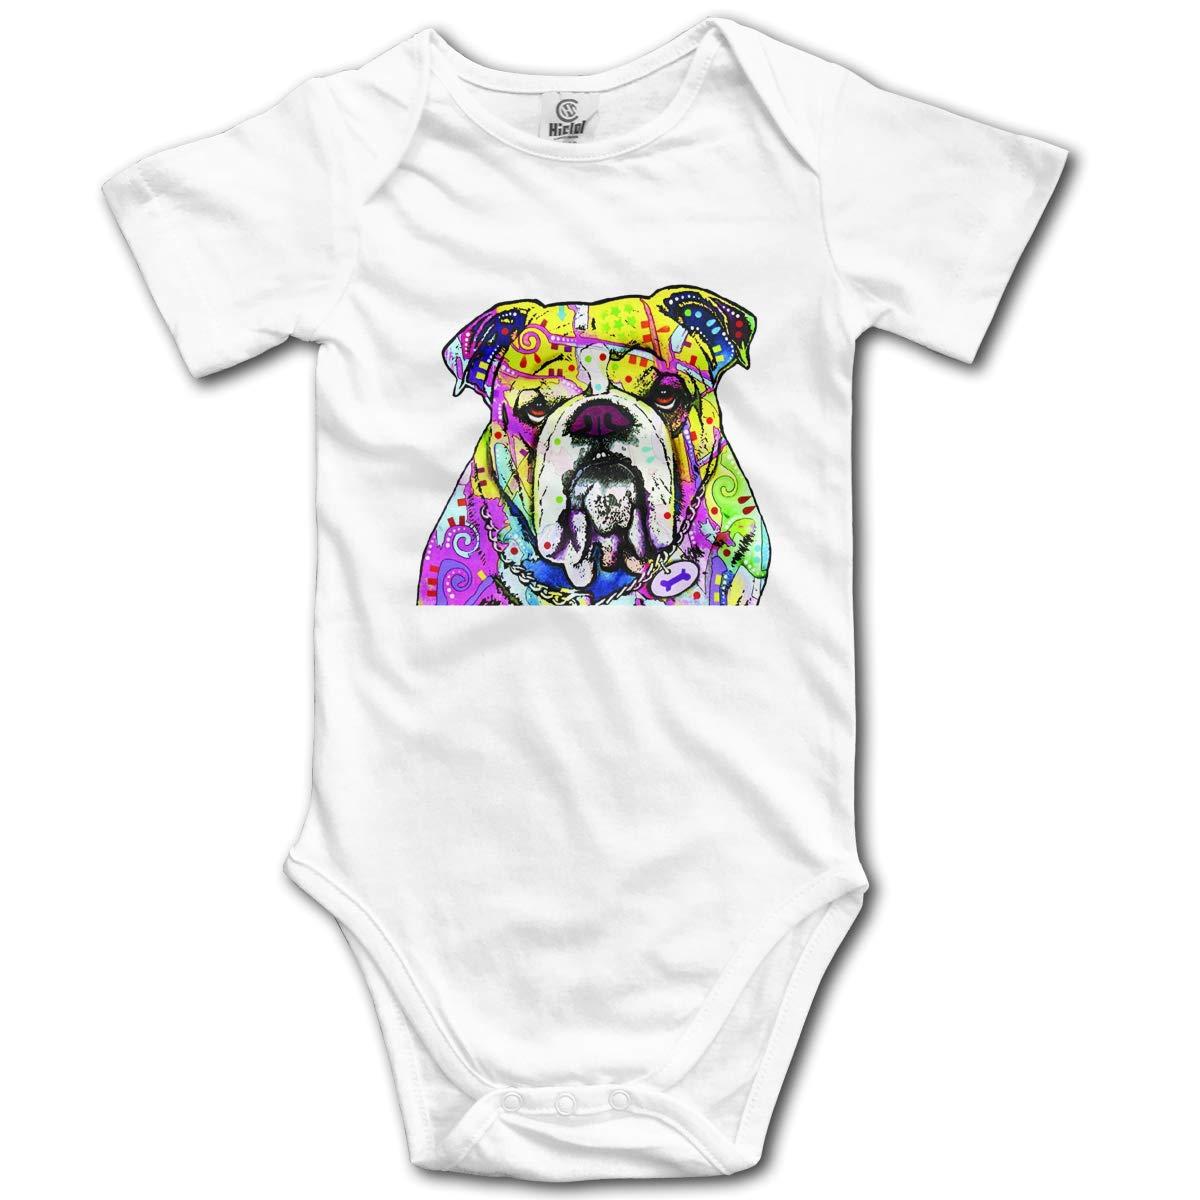 Coollifea Bulldog Baby Romper 0-18 Months Newborn Baby Girls Boys Layette Rompers Black